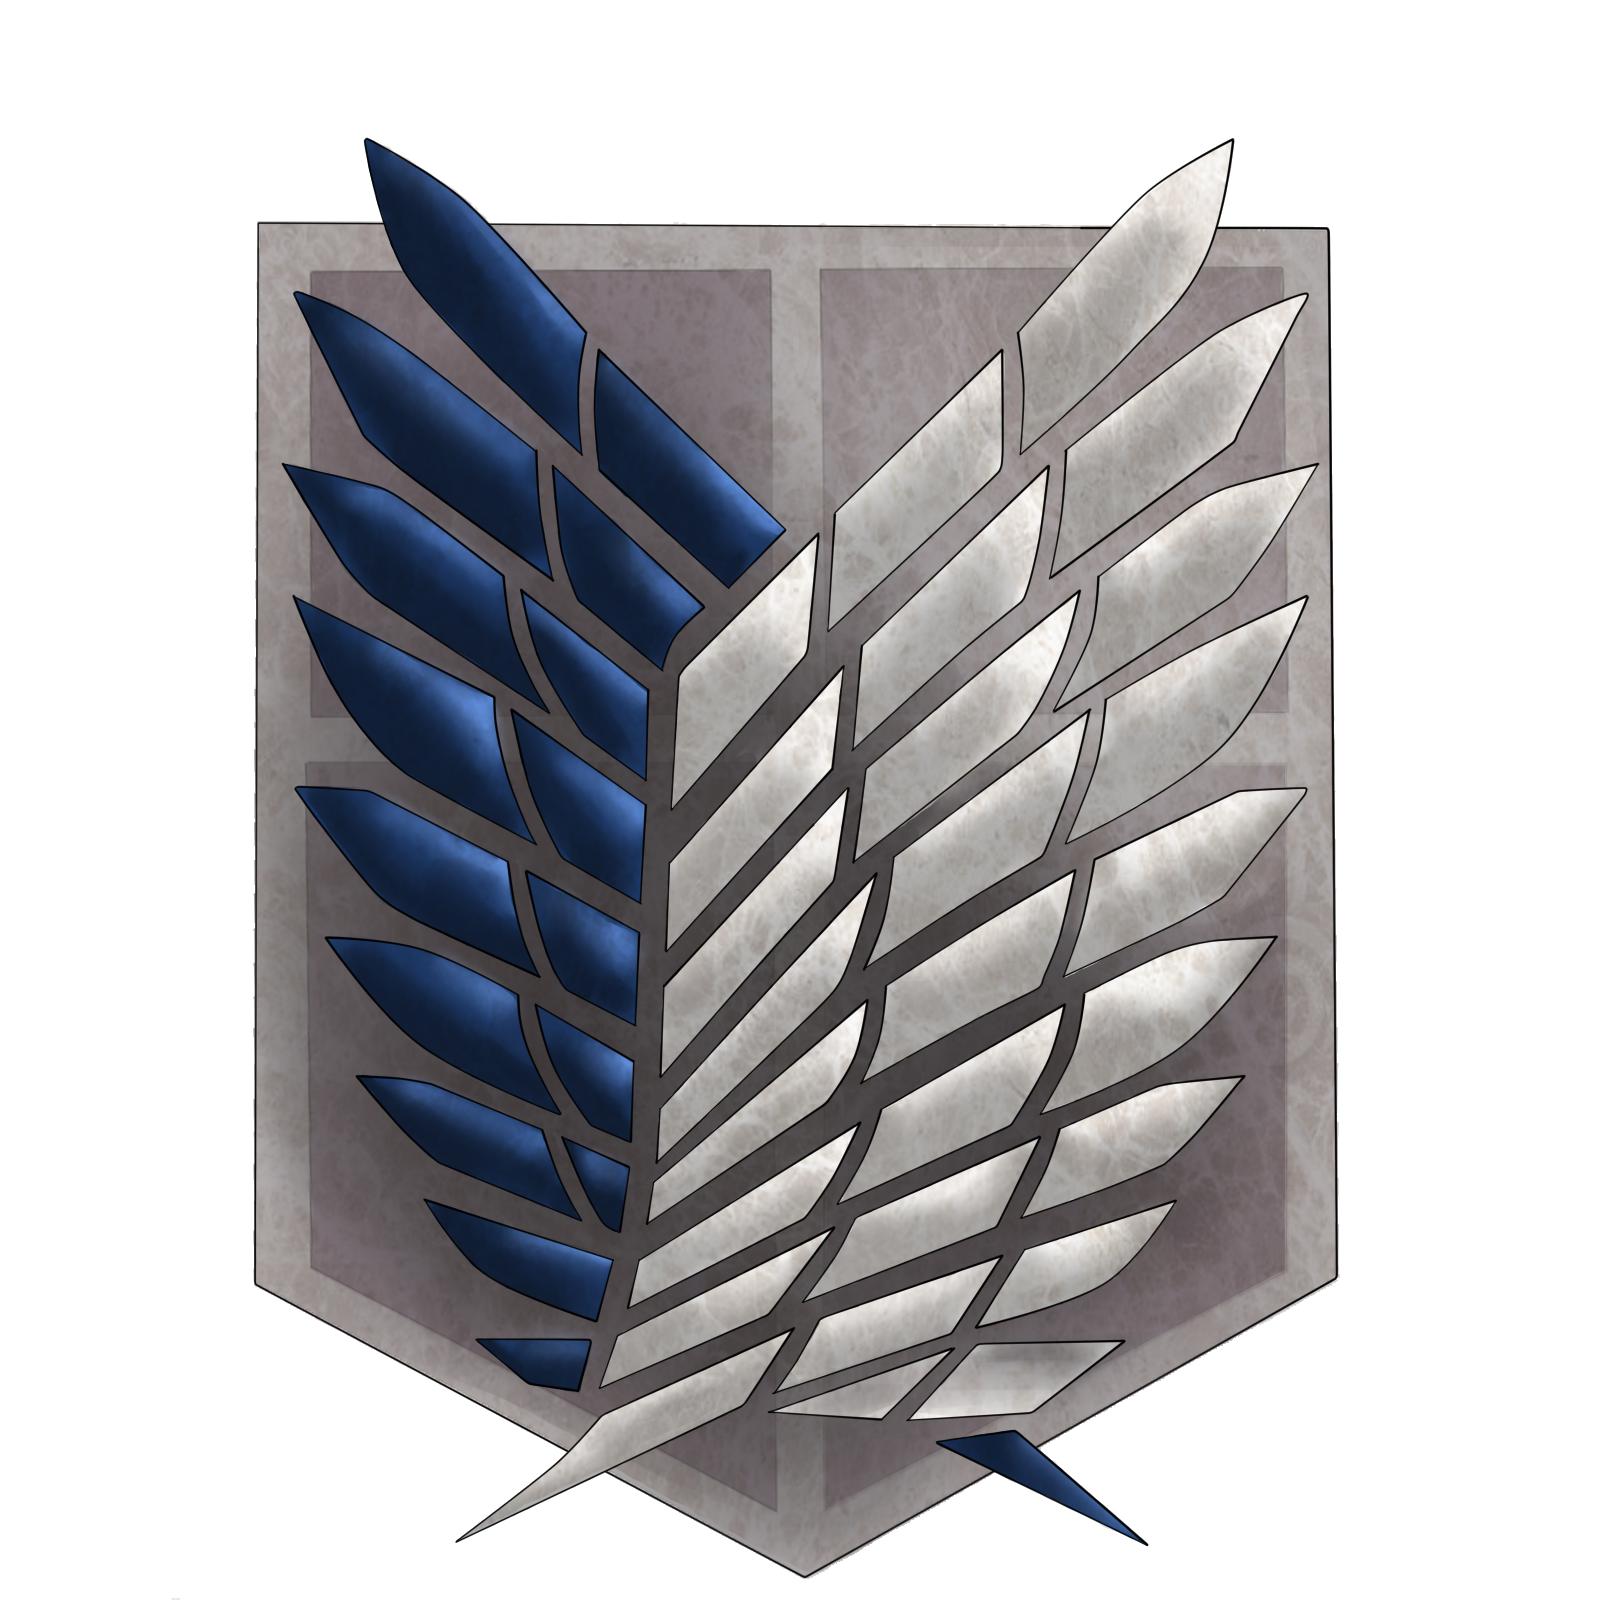 Scouting Legion shield - SNK by Sakkushi